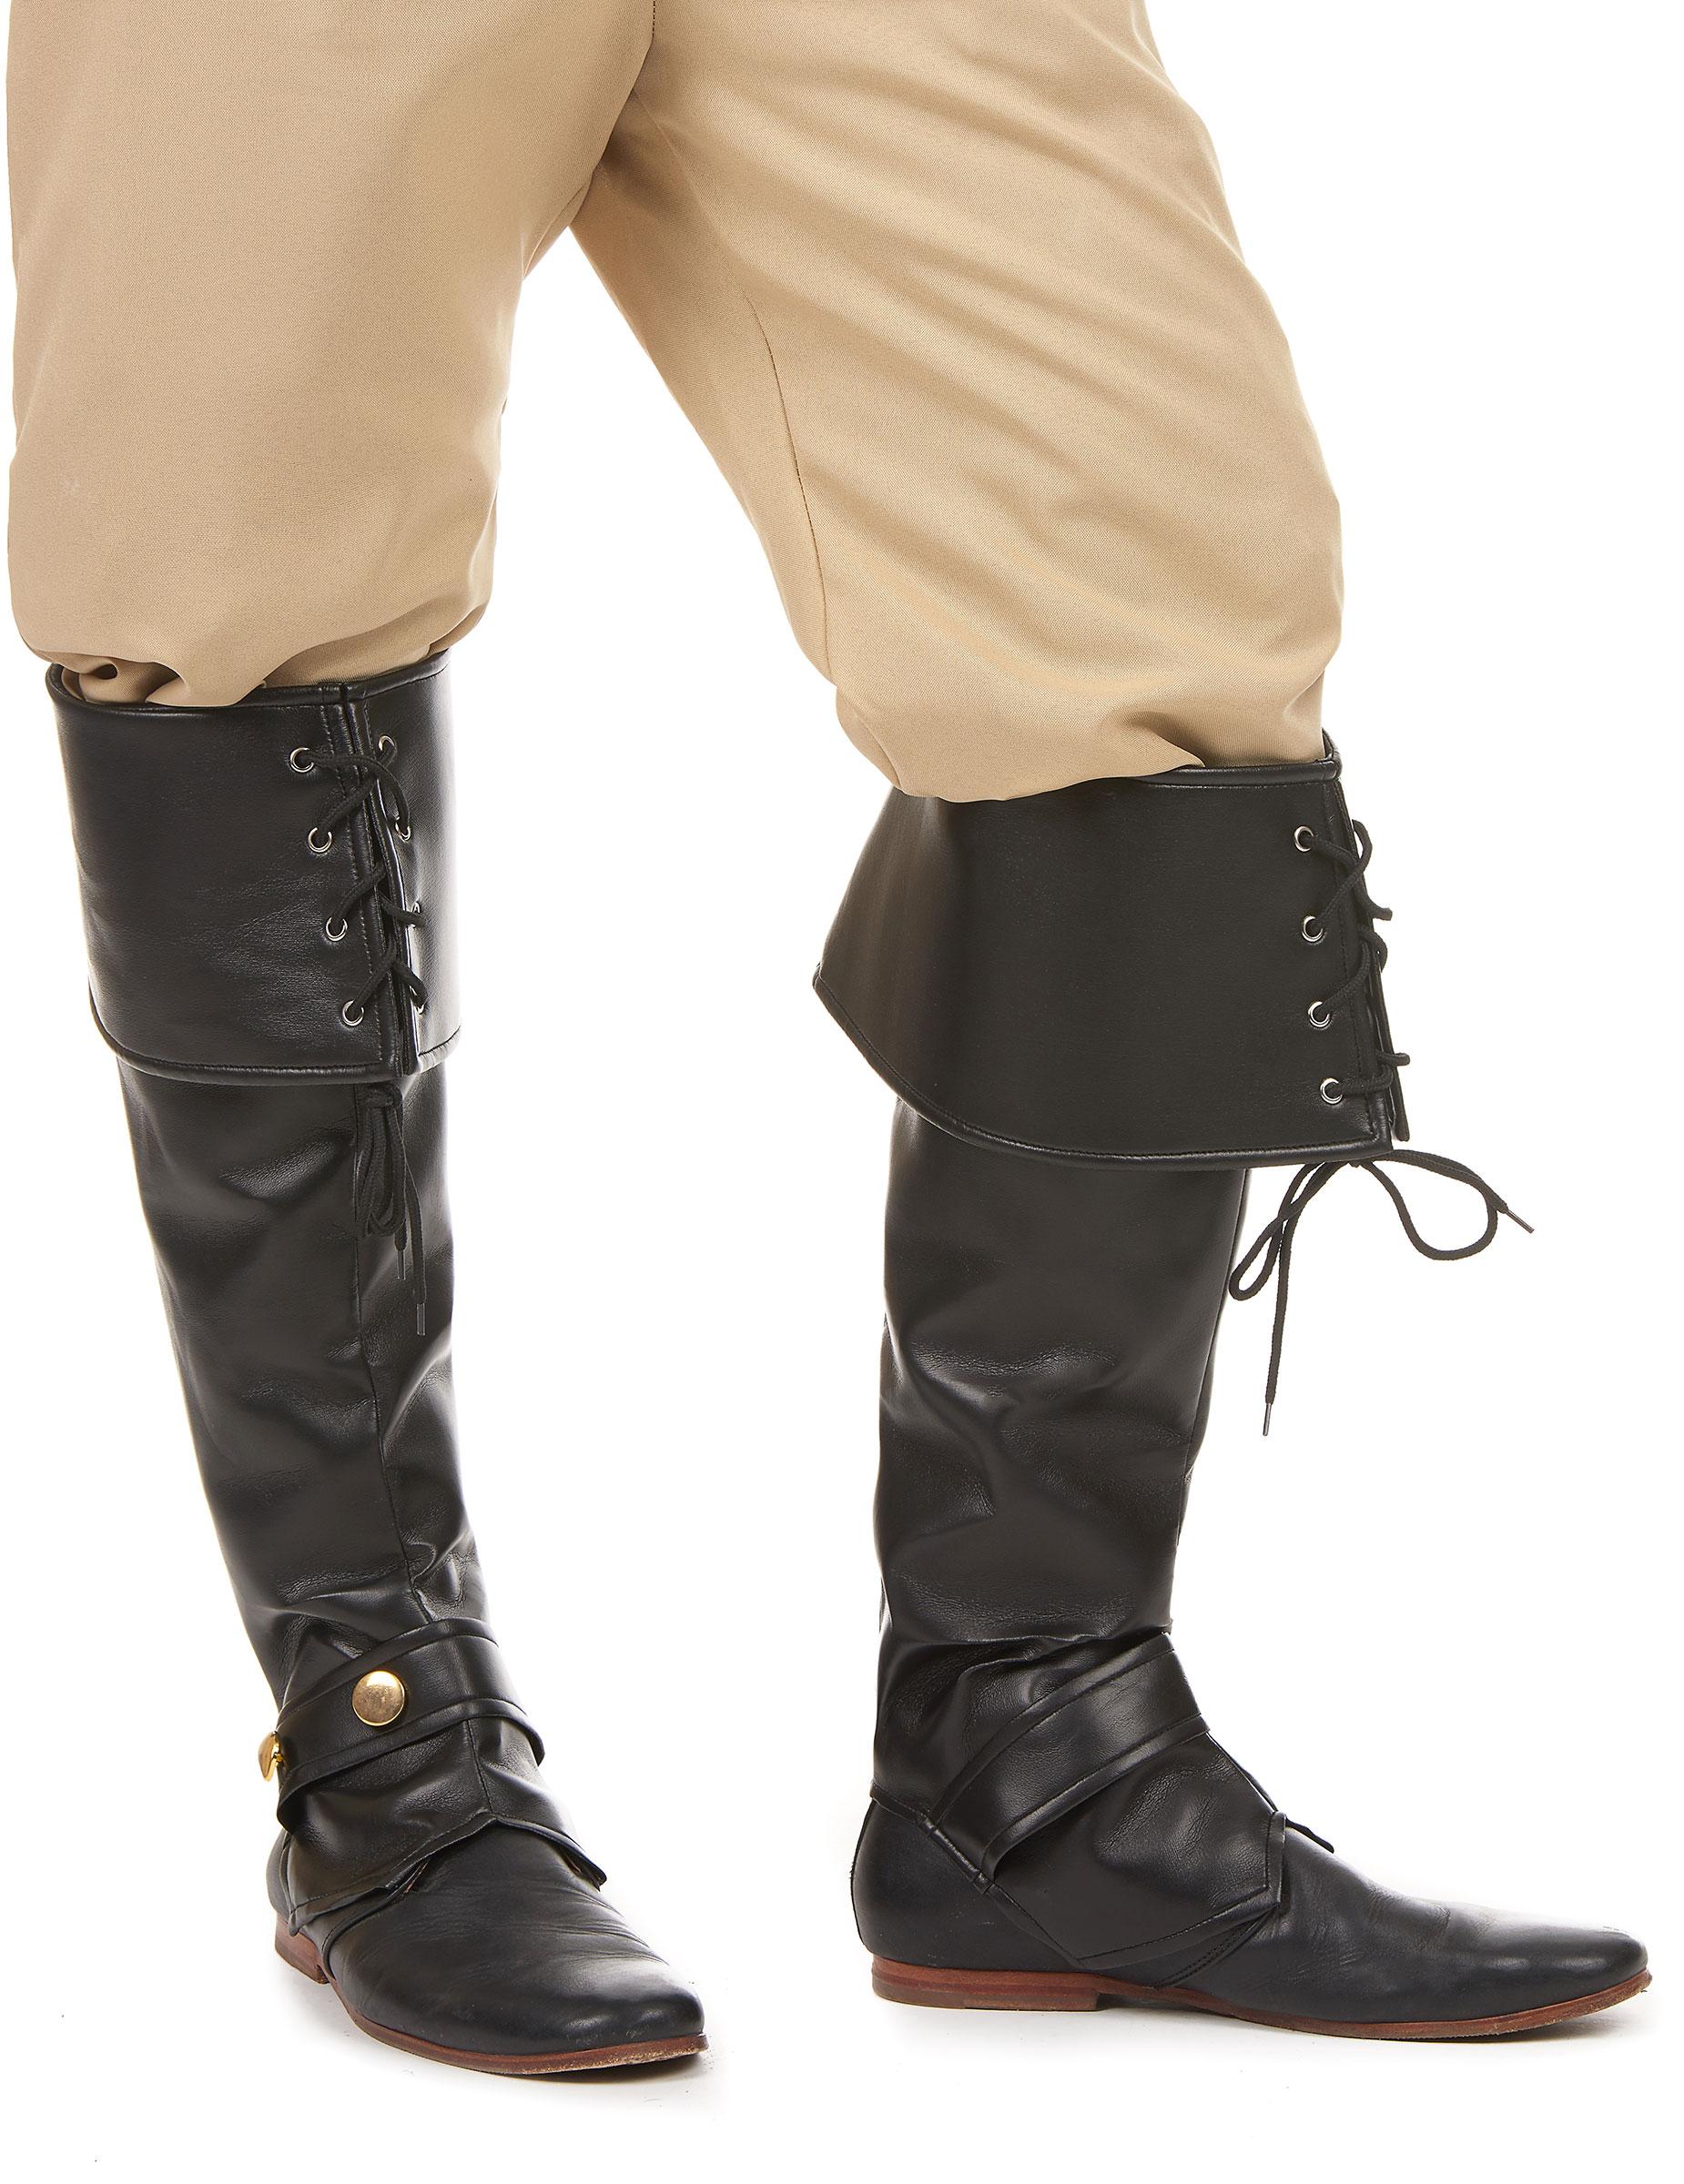 Piraten Stiefelstulpen Deluxe schwarz